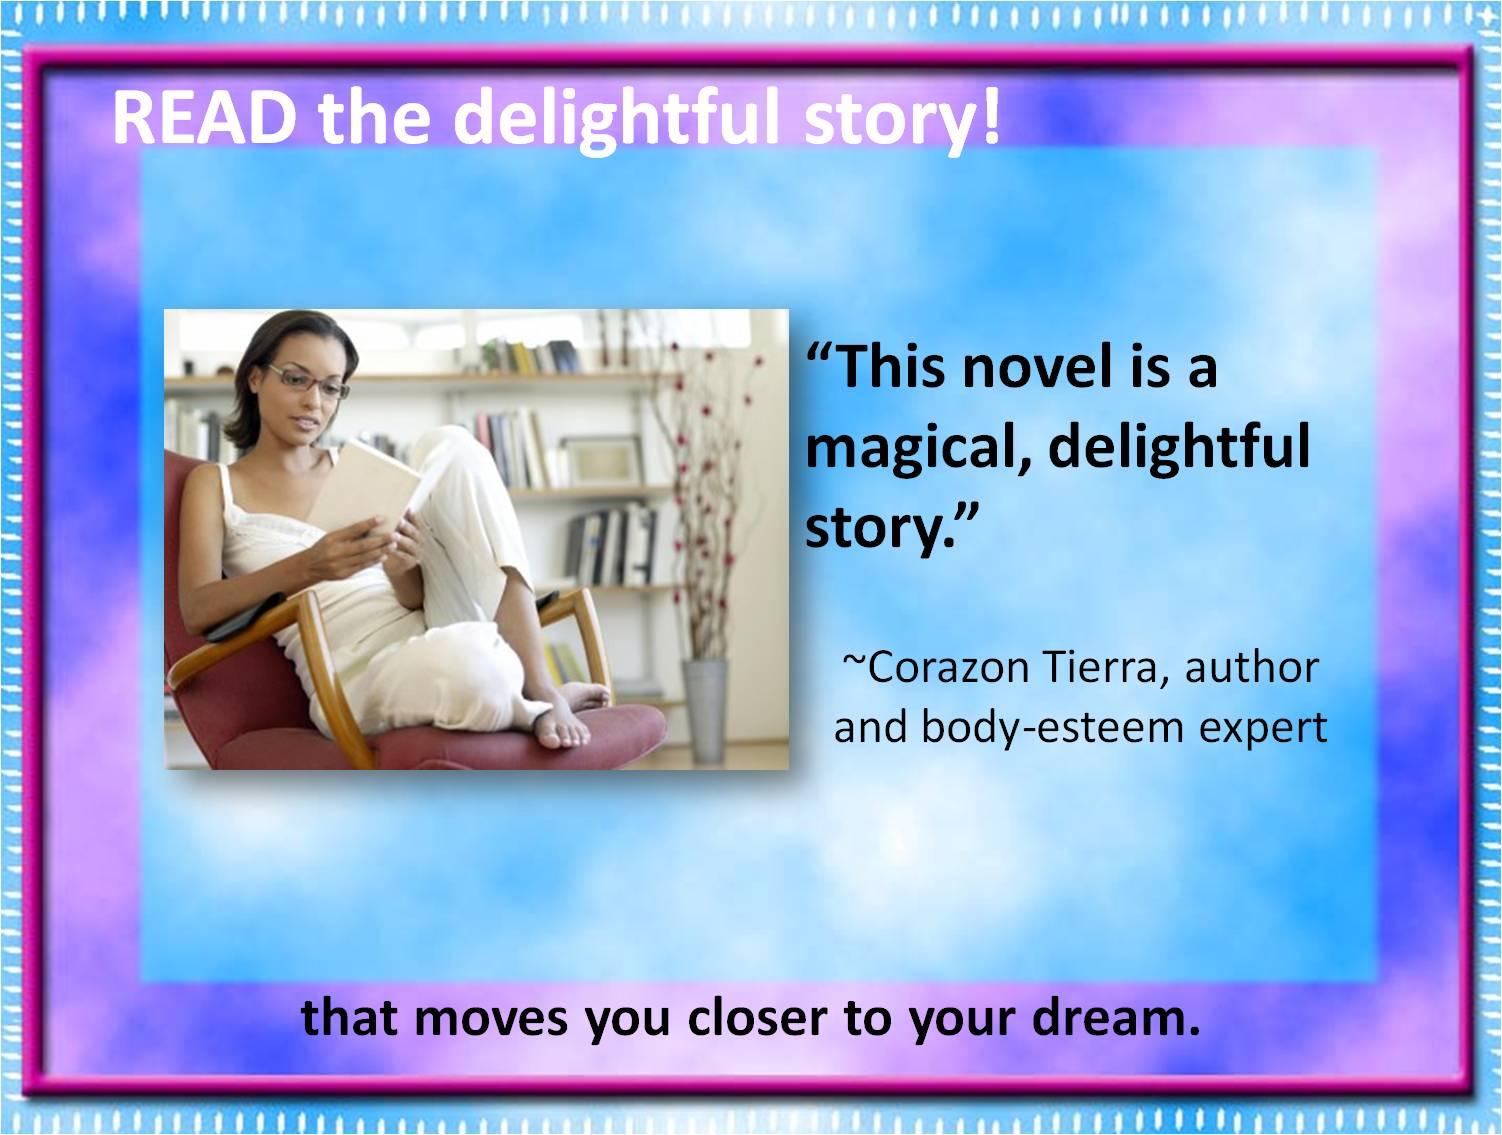 dreamexpress-virtualtourB-slide14-read